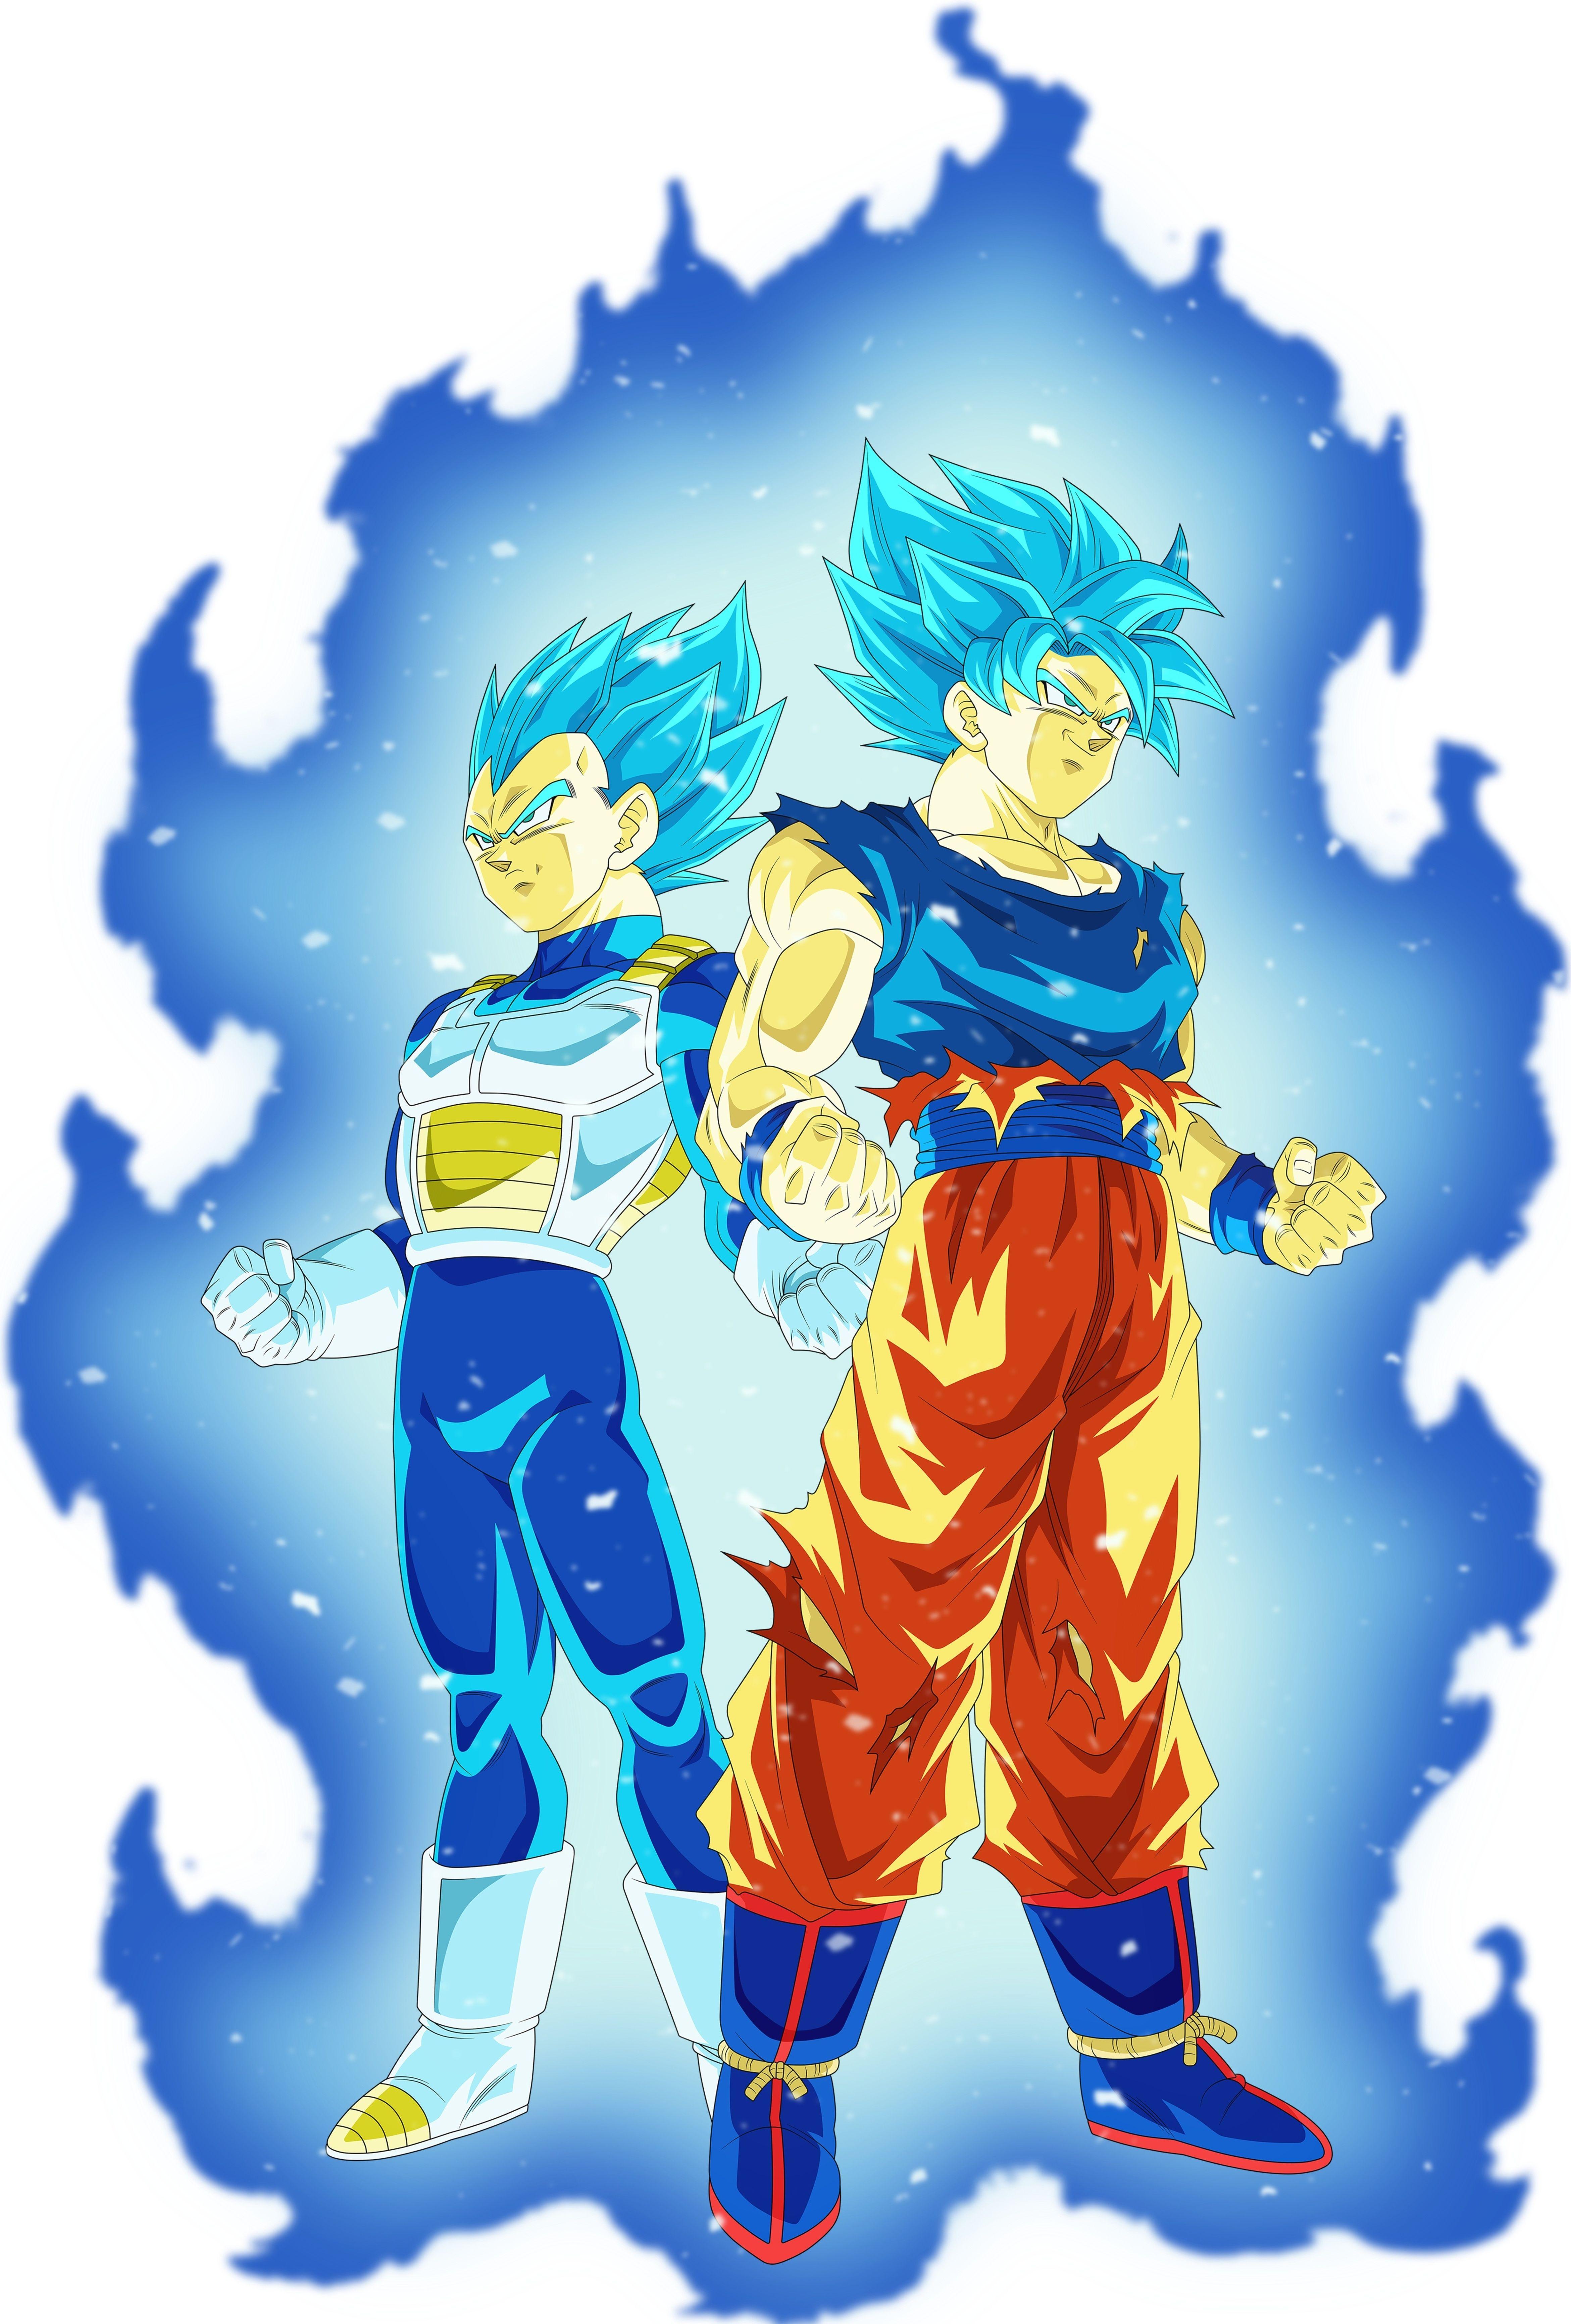 Vegeta Ssj Blue Goku Ssj Blue Universo 7 Dragon Ball Super Manga Anime Dragon Ball Super Dragon Ball Art Goku